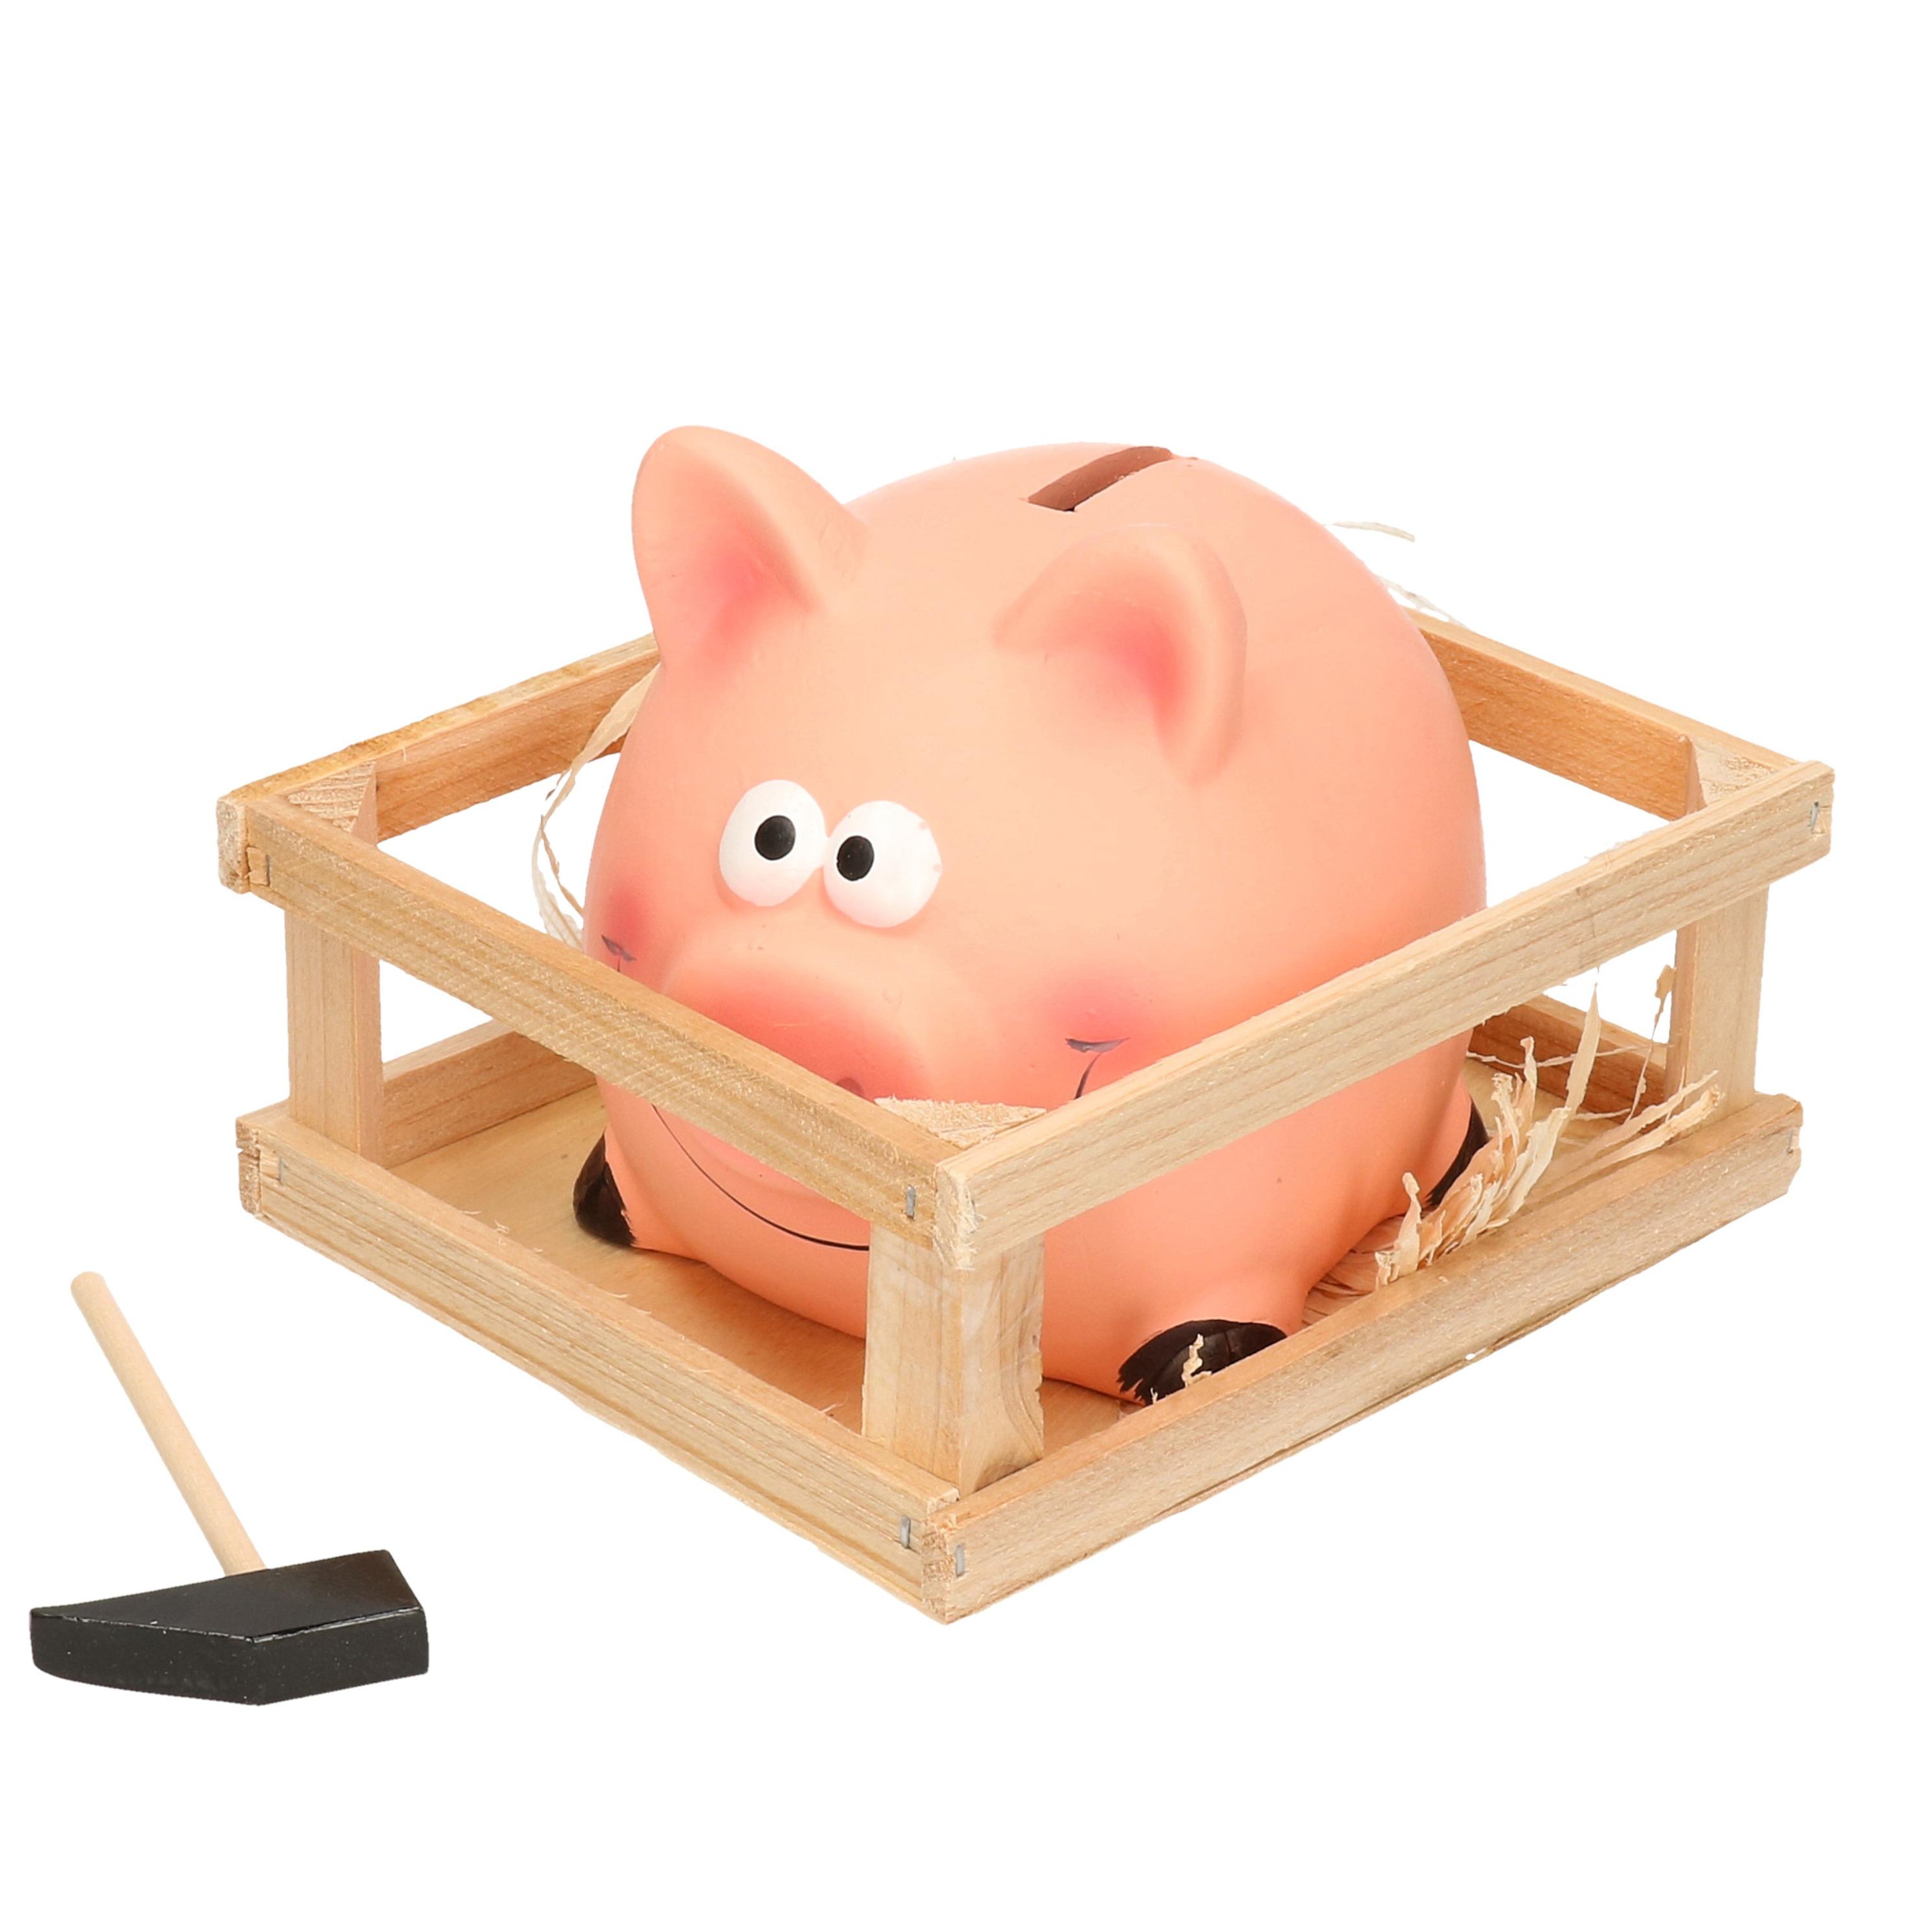 Roze spaarvarken met hamer in kistje